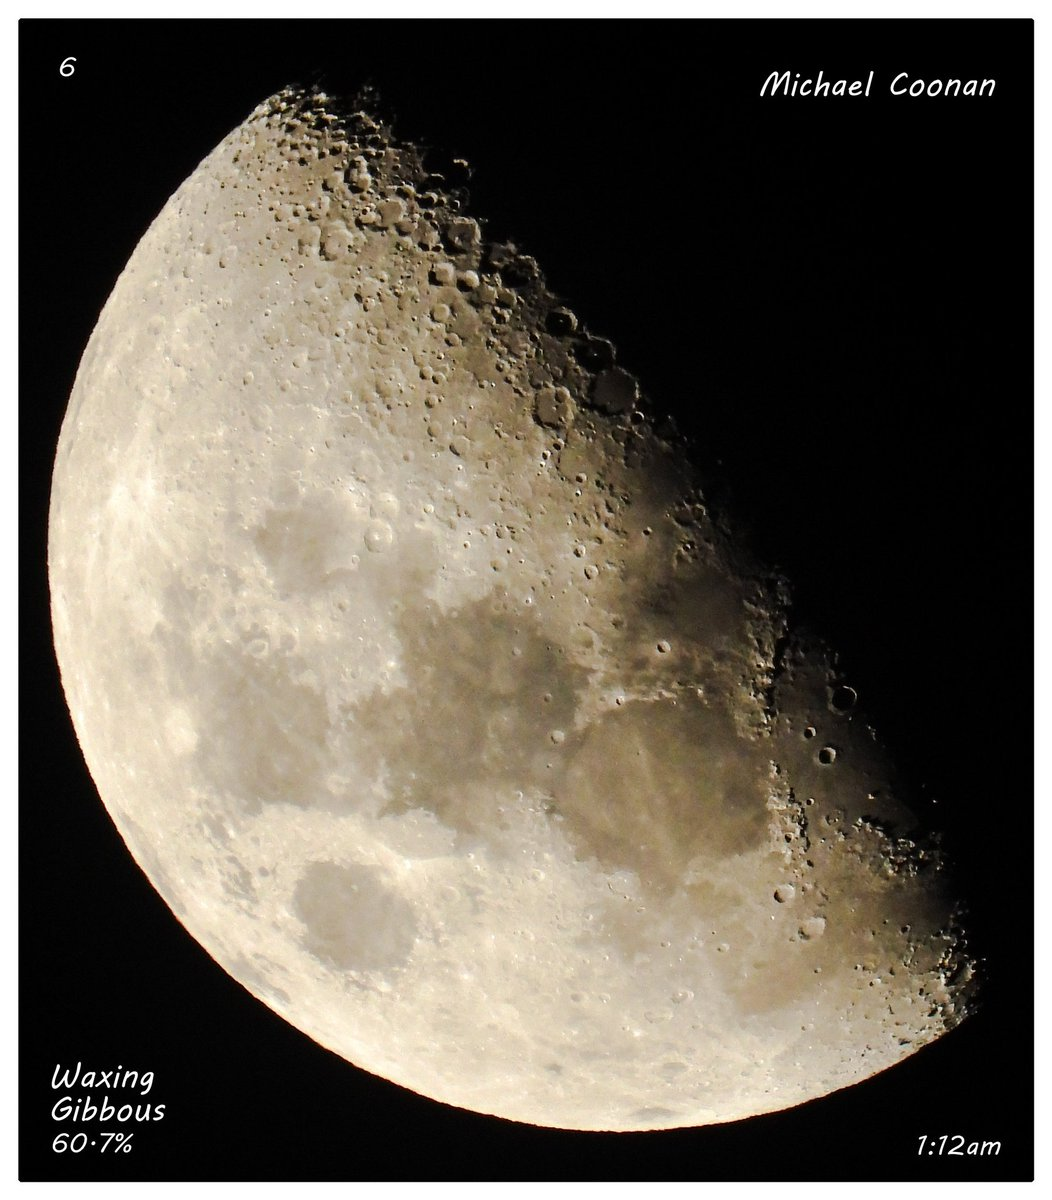 Sunday October 25th Waxing Gibbous Moon 60.7% in Wodonga Australia #StormHour #moon #luna #moonshot #Moon_awards #astrophotography #astronomy @CherScheff @KayMcCaffery1 @PicPublic @PicPoet #500pxrtg @ThePhotoHour @BonfirePictures @500pxrtg https://t.co/XXTPdtwzgb